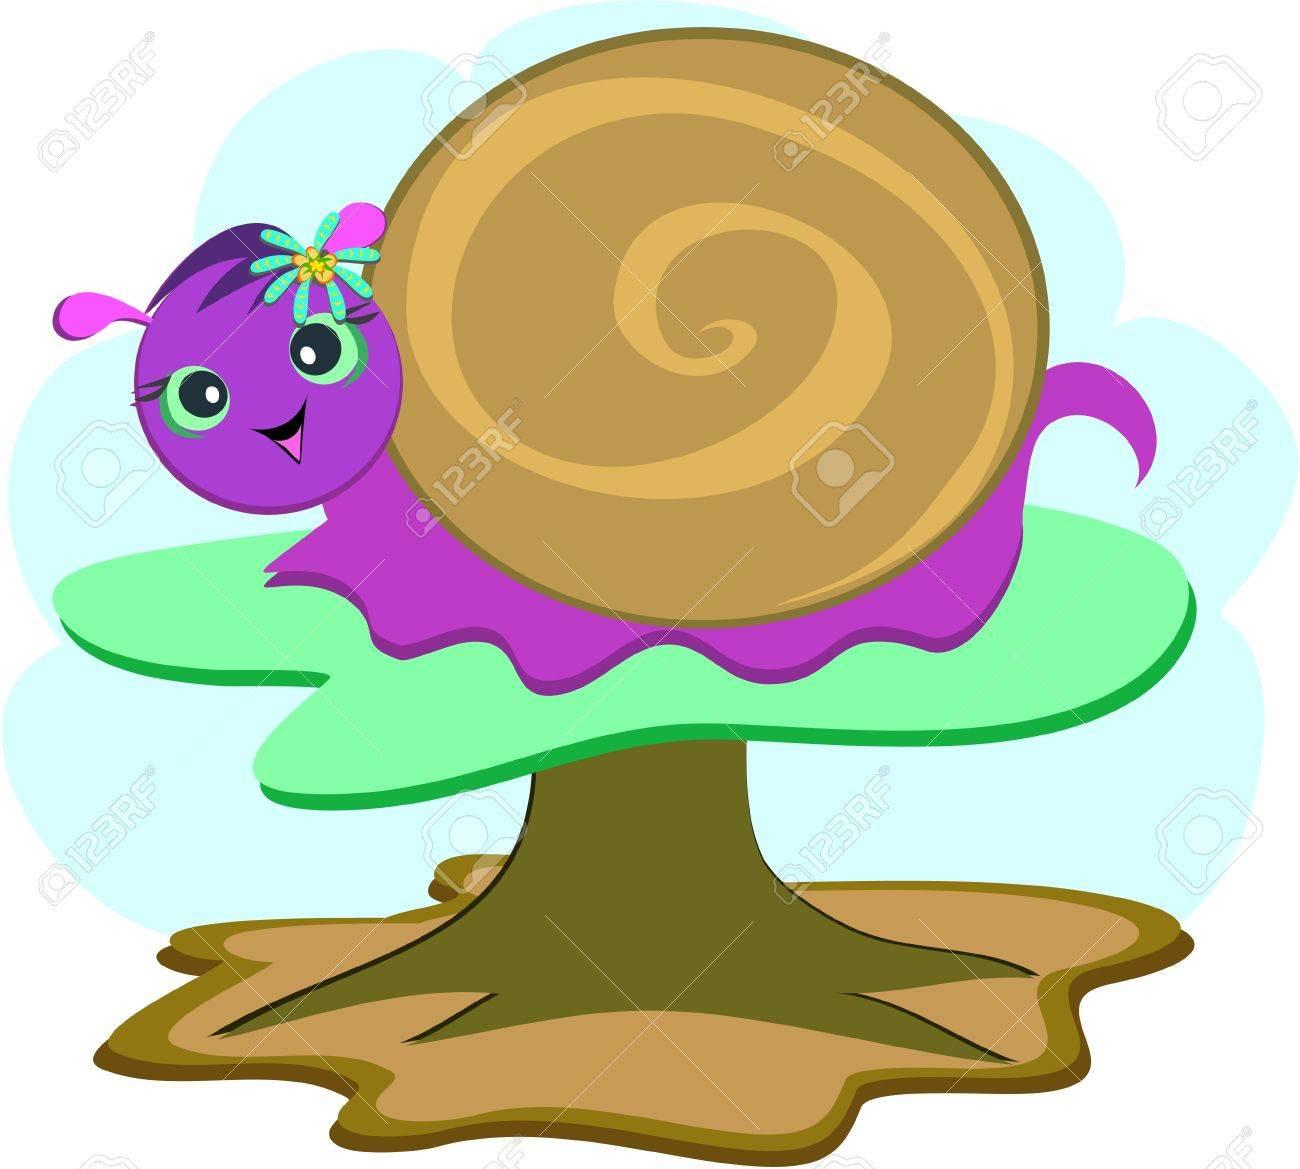 Purple Snail on a Mushroom Stock Vector - 11094455